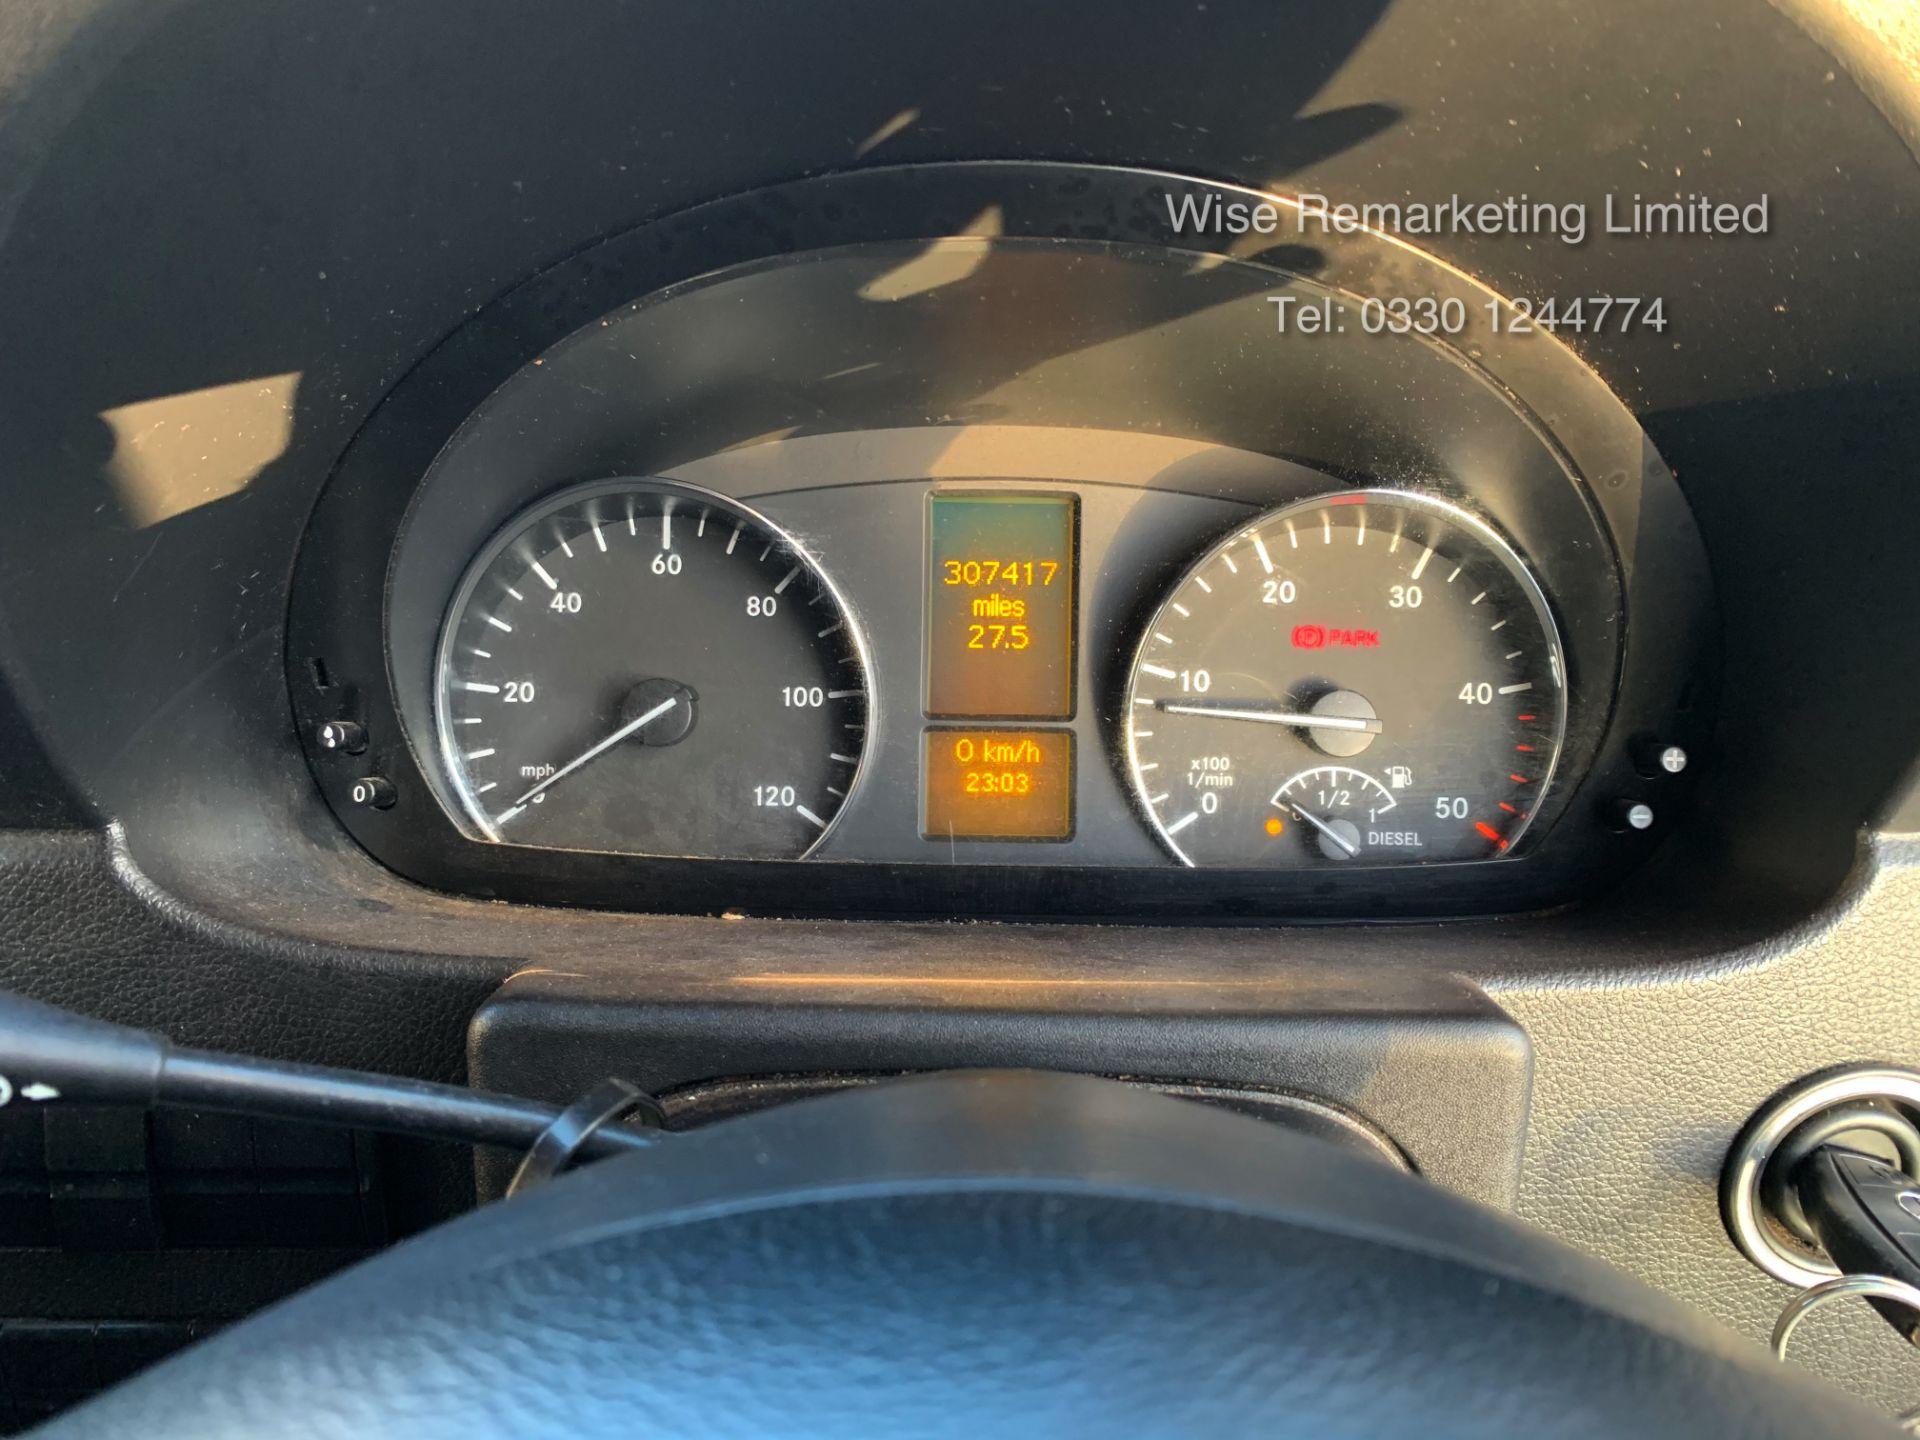 Lot 15 - Mercedes Sprinter 316 2.1 CDI Long Wheel Base High Roof Van - 2013 13 Reg - 1 Owner From New